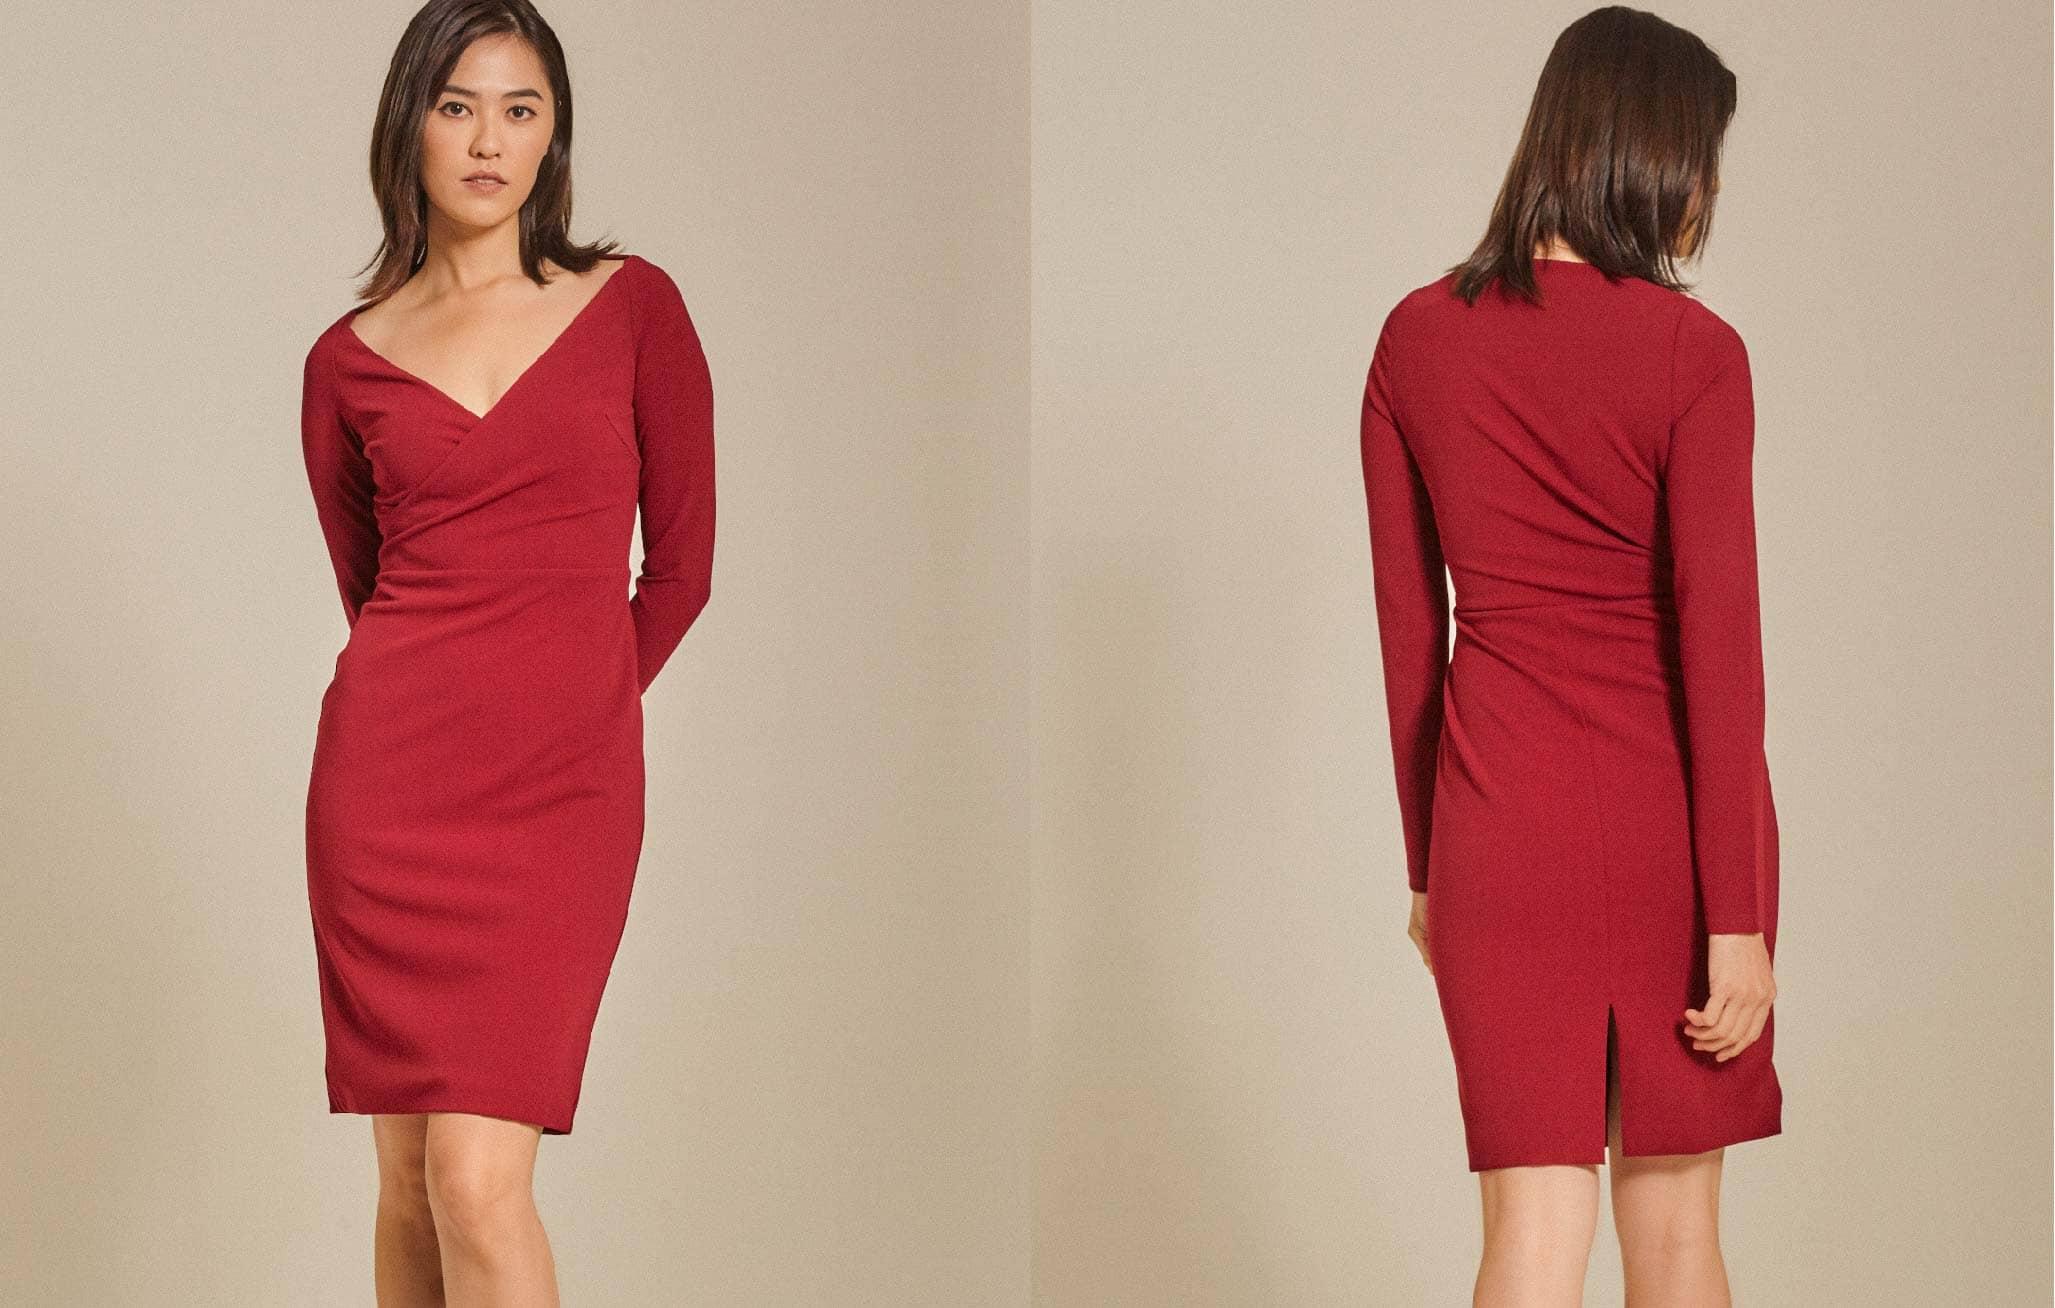 Long-Sleeved Roma Knit Bodycon Dress